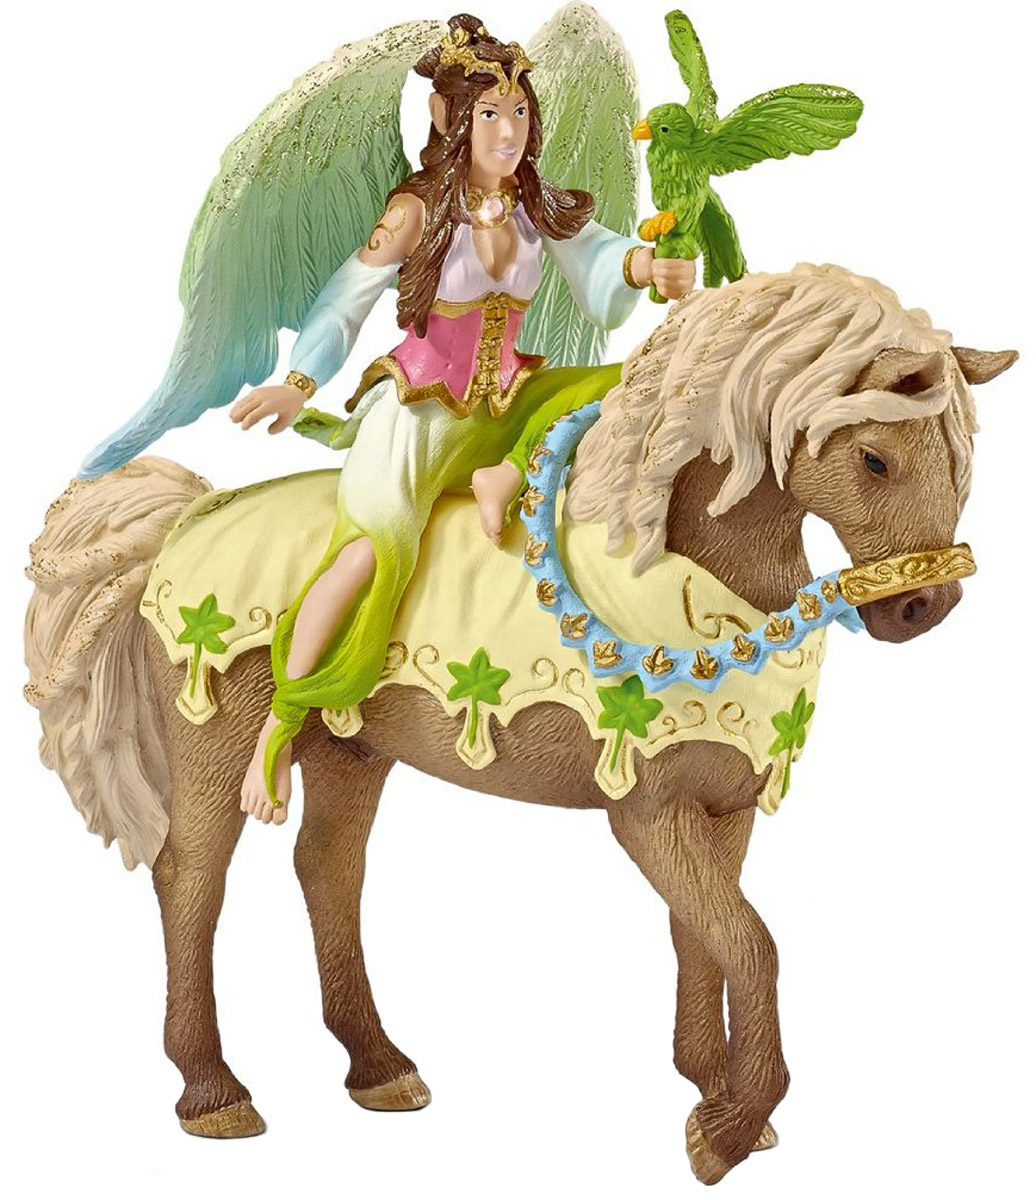 Schleich Фигурка Эльфийка Сурах на лошади фигурка карликовый козел schleich фигурка карликовый козел